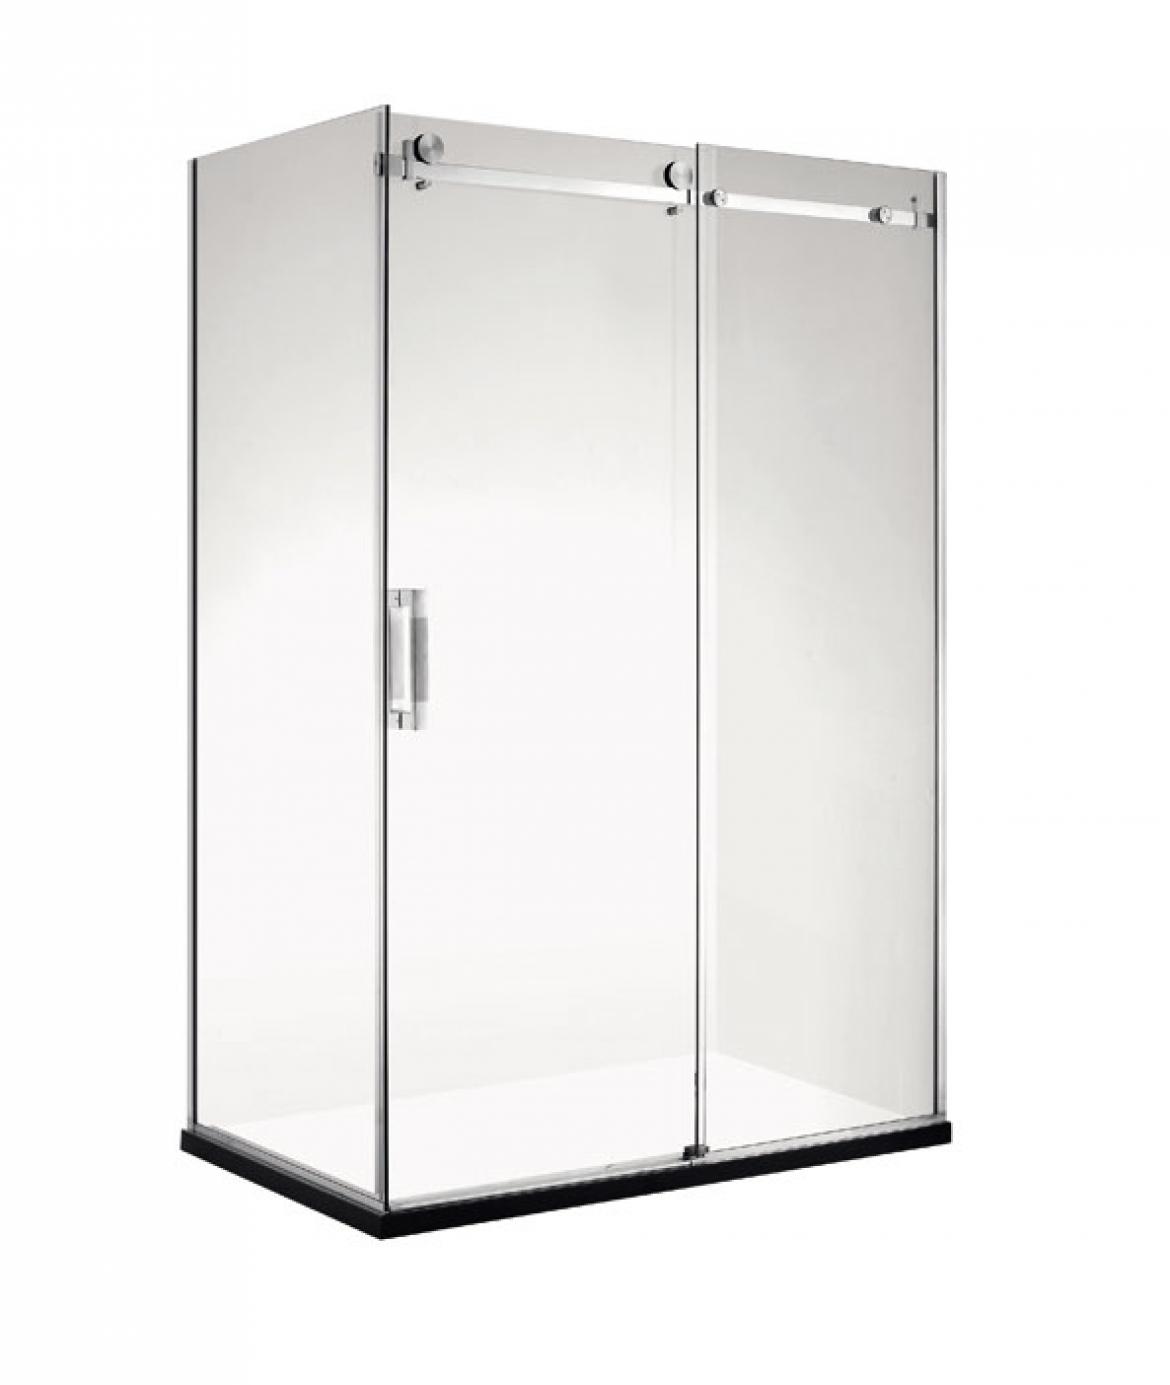 Frameless Shower Screen [1200 x 900 mm]